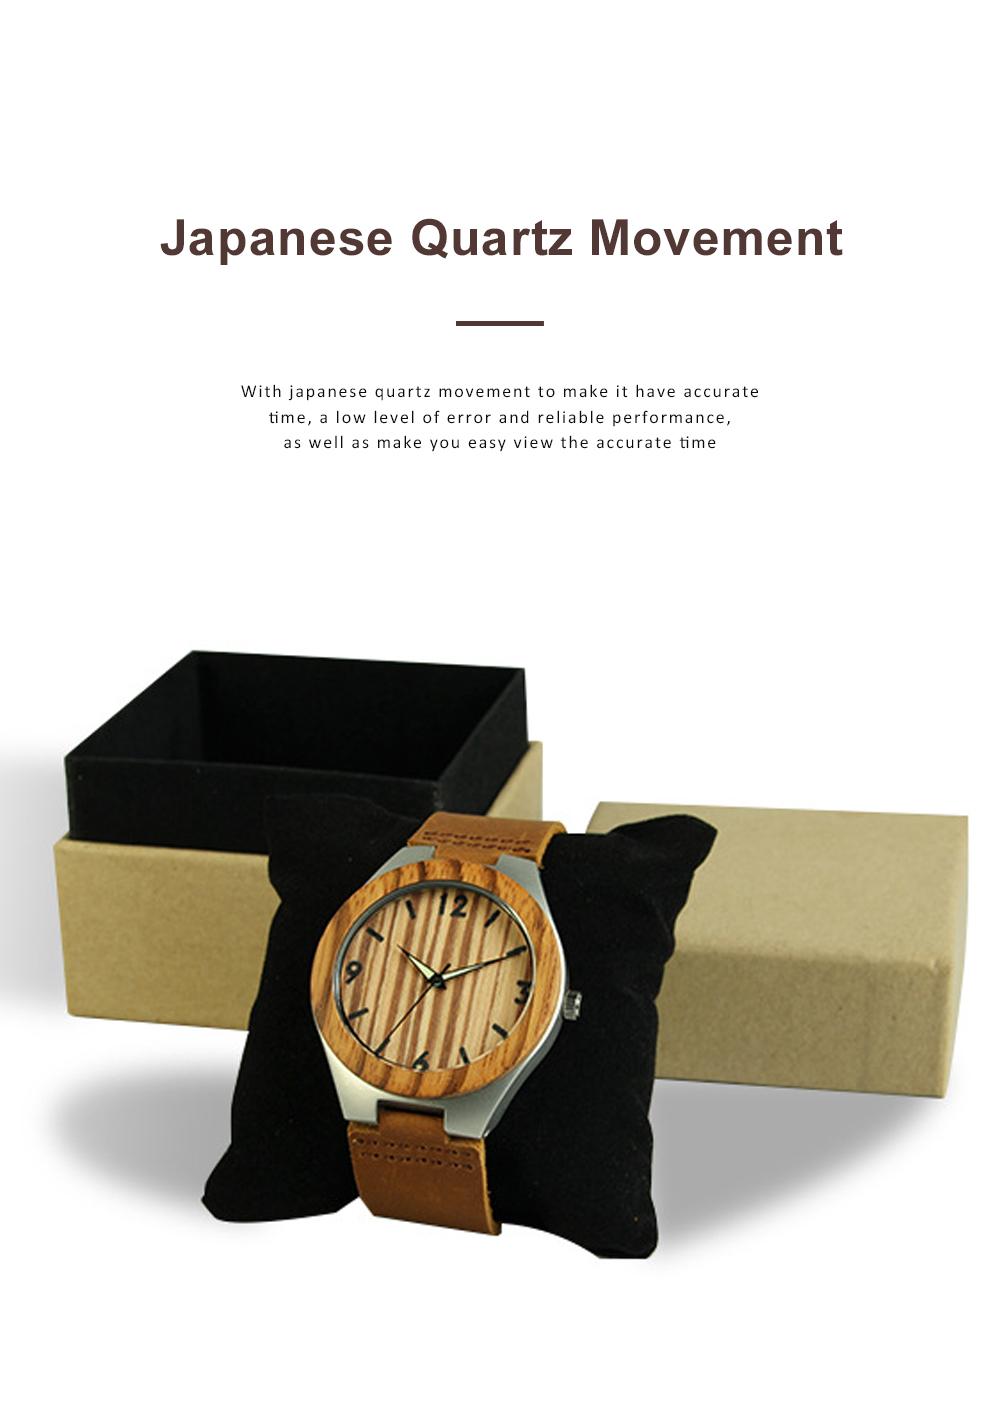 Women Watches Elegant Wood Band Stainless Steel Quartz Wrist Bamboo Watch With Waterproof Wristwatch For Ladies Girls 1